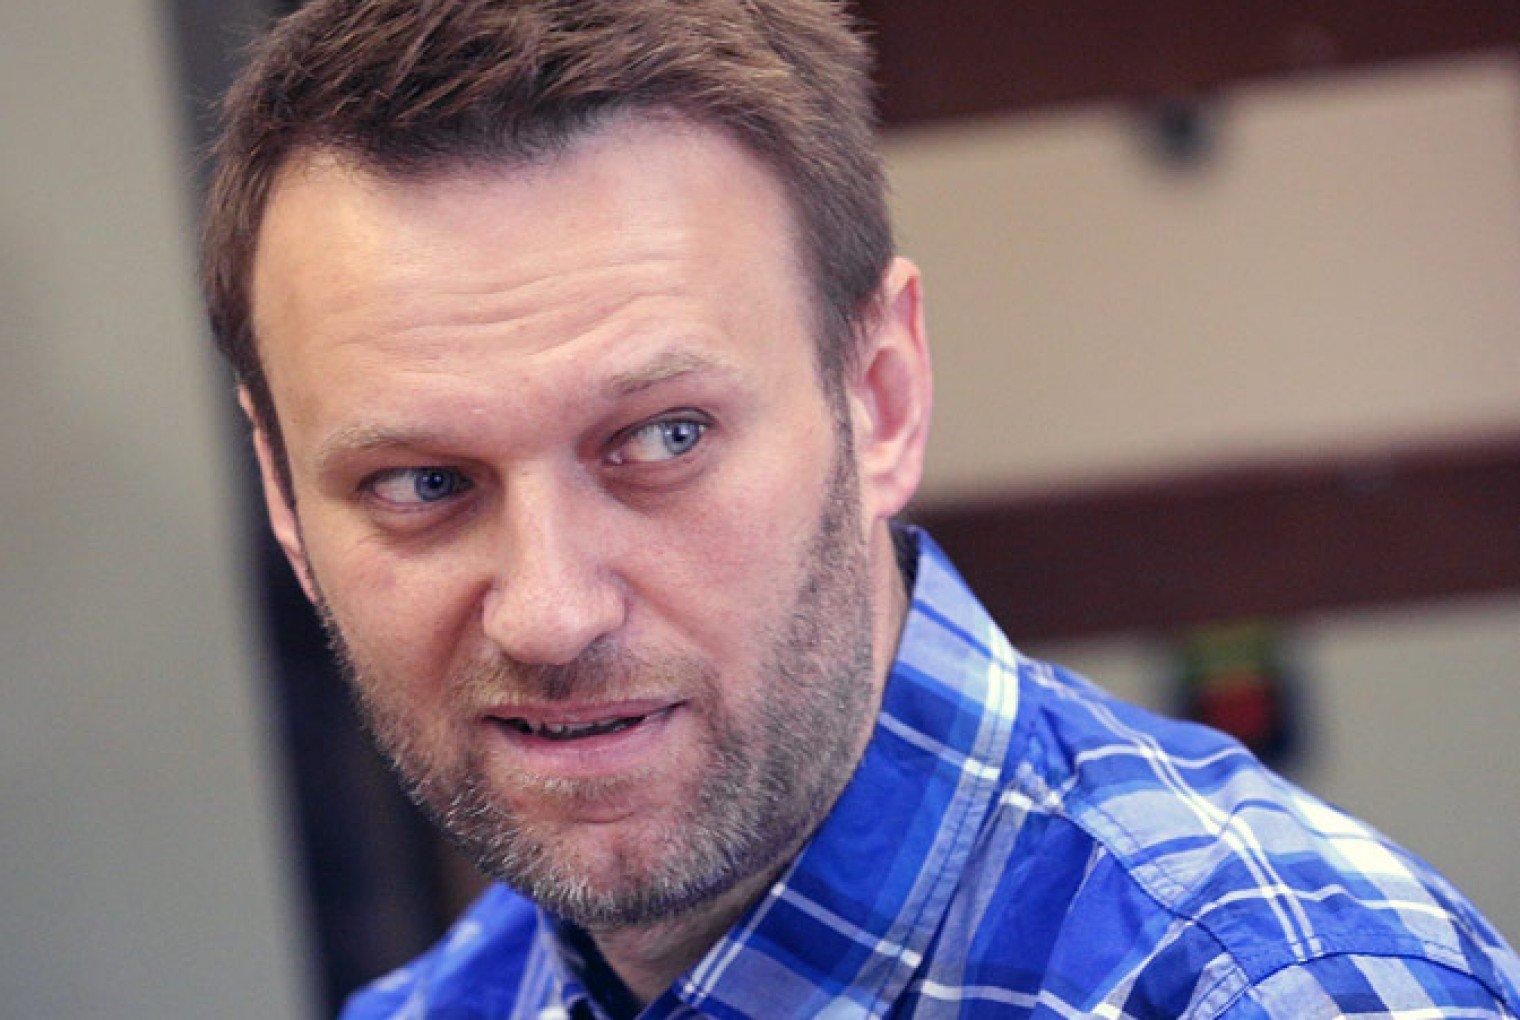 Заодно с террористами: почему команда Навального поддержала Хизб ут-Тахрир